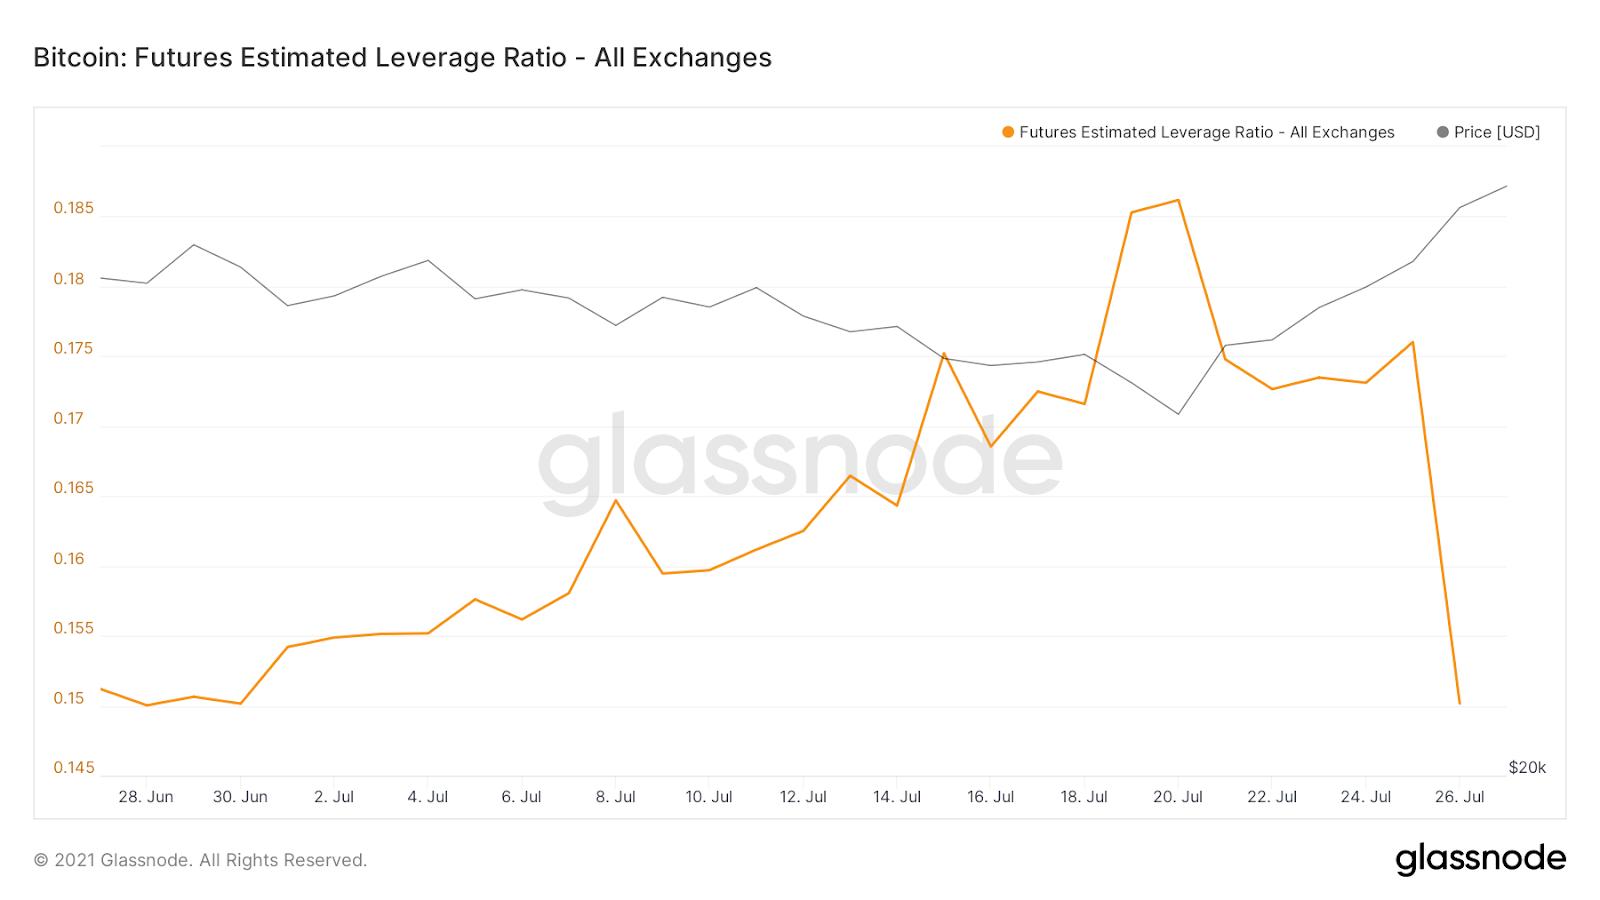 Bitcoin Futures-Estimated-Leverage-Ratio Glassnode